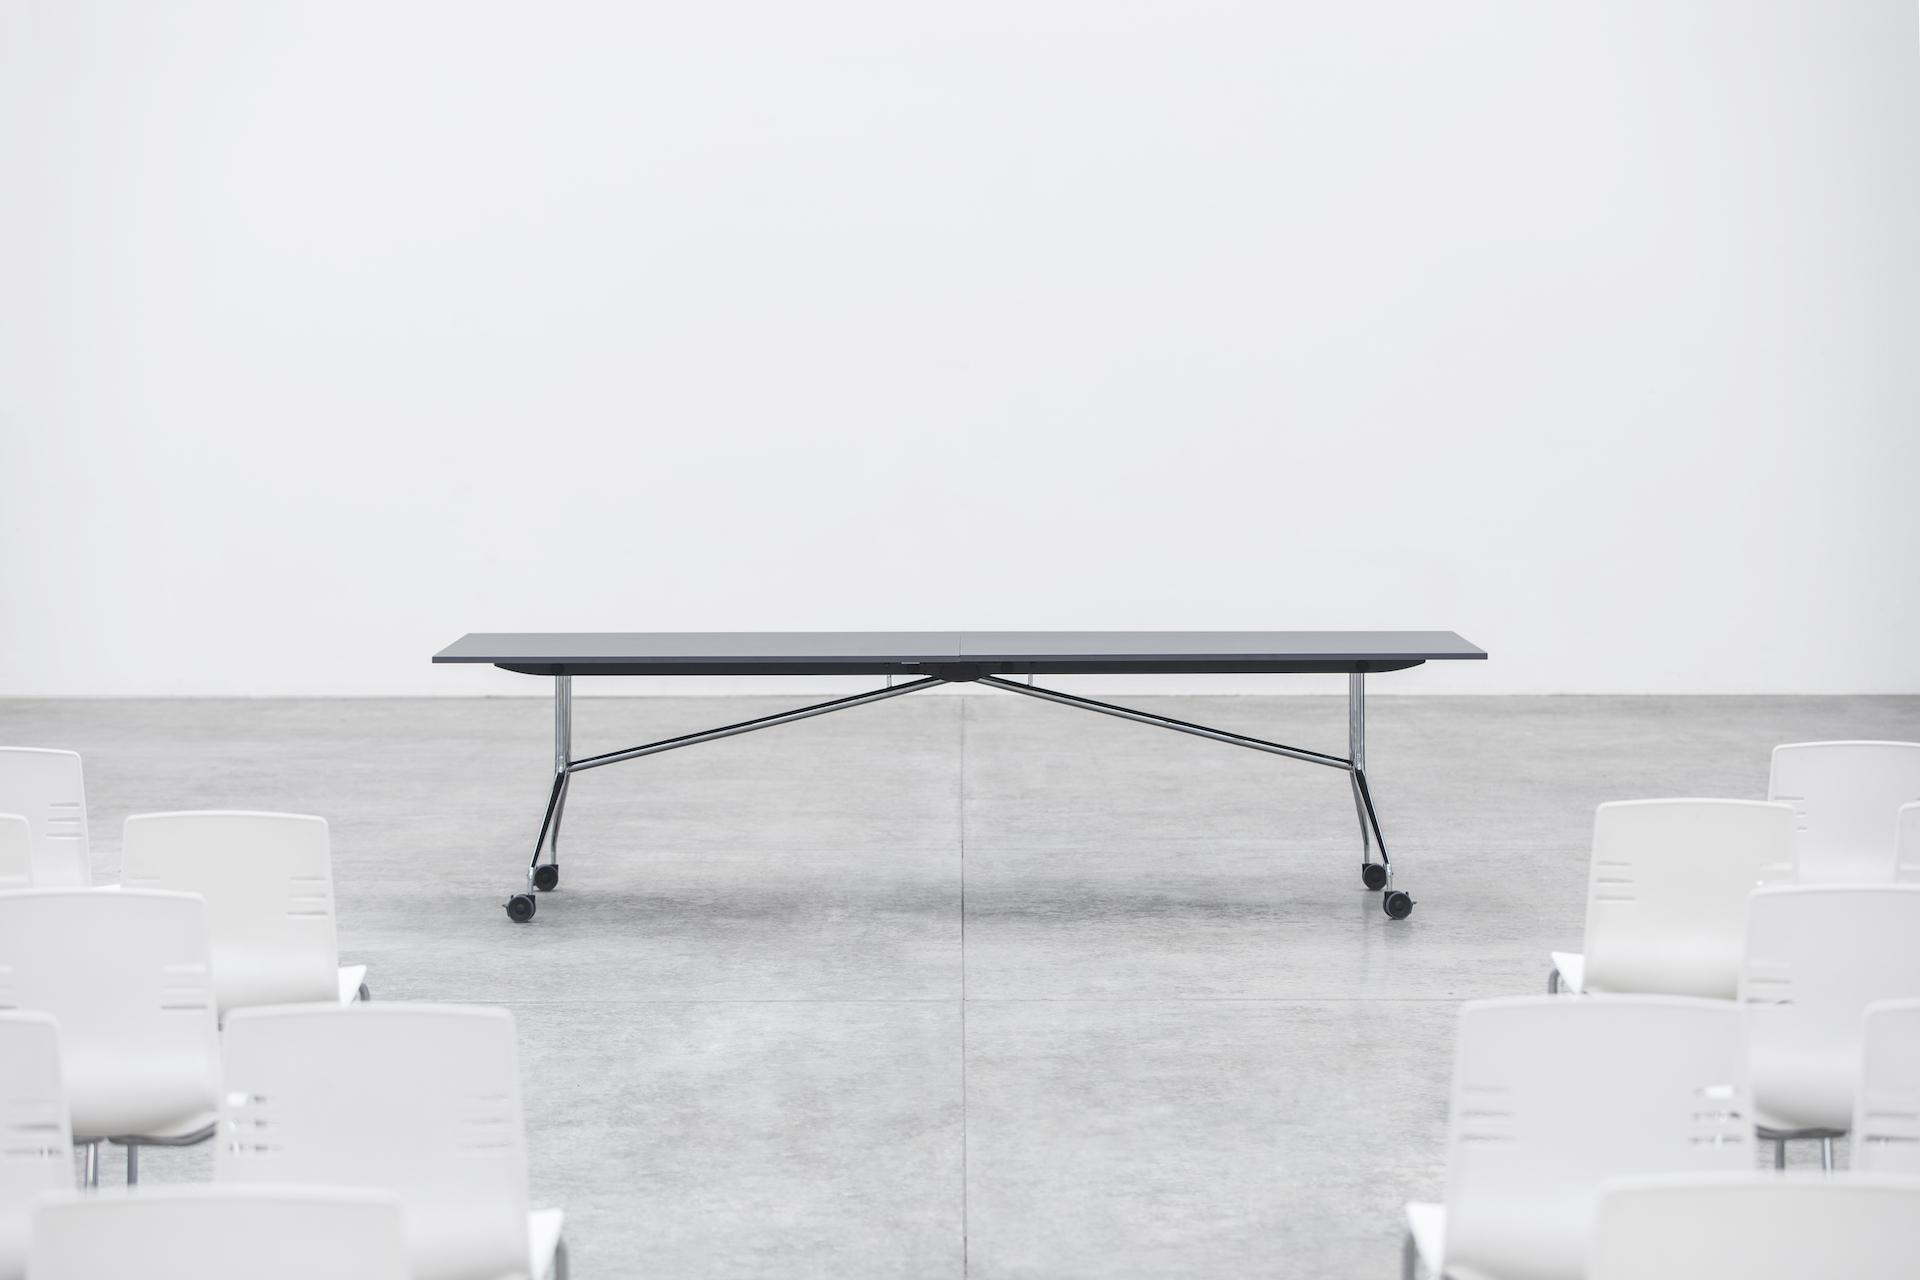 Argo Libro salokāms galds